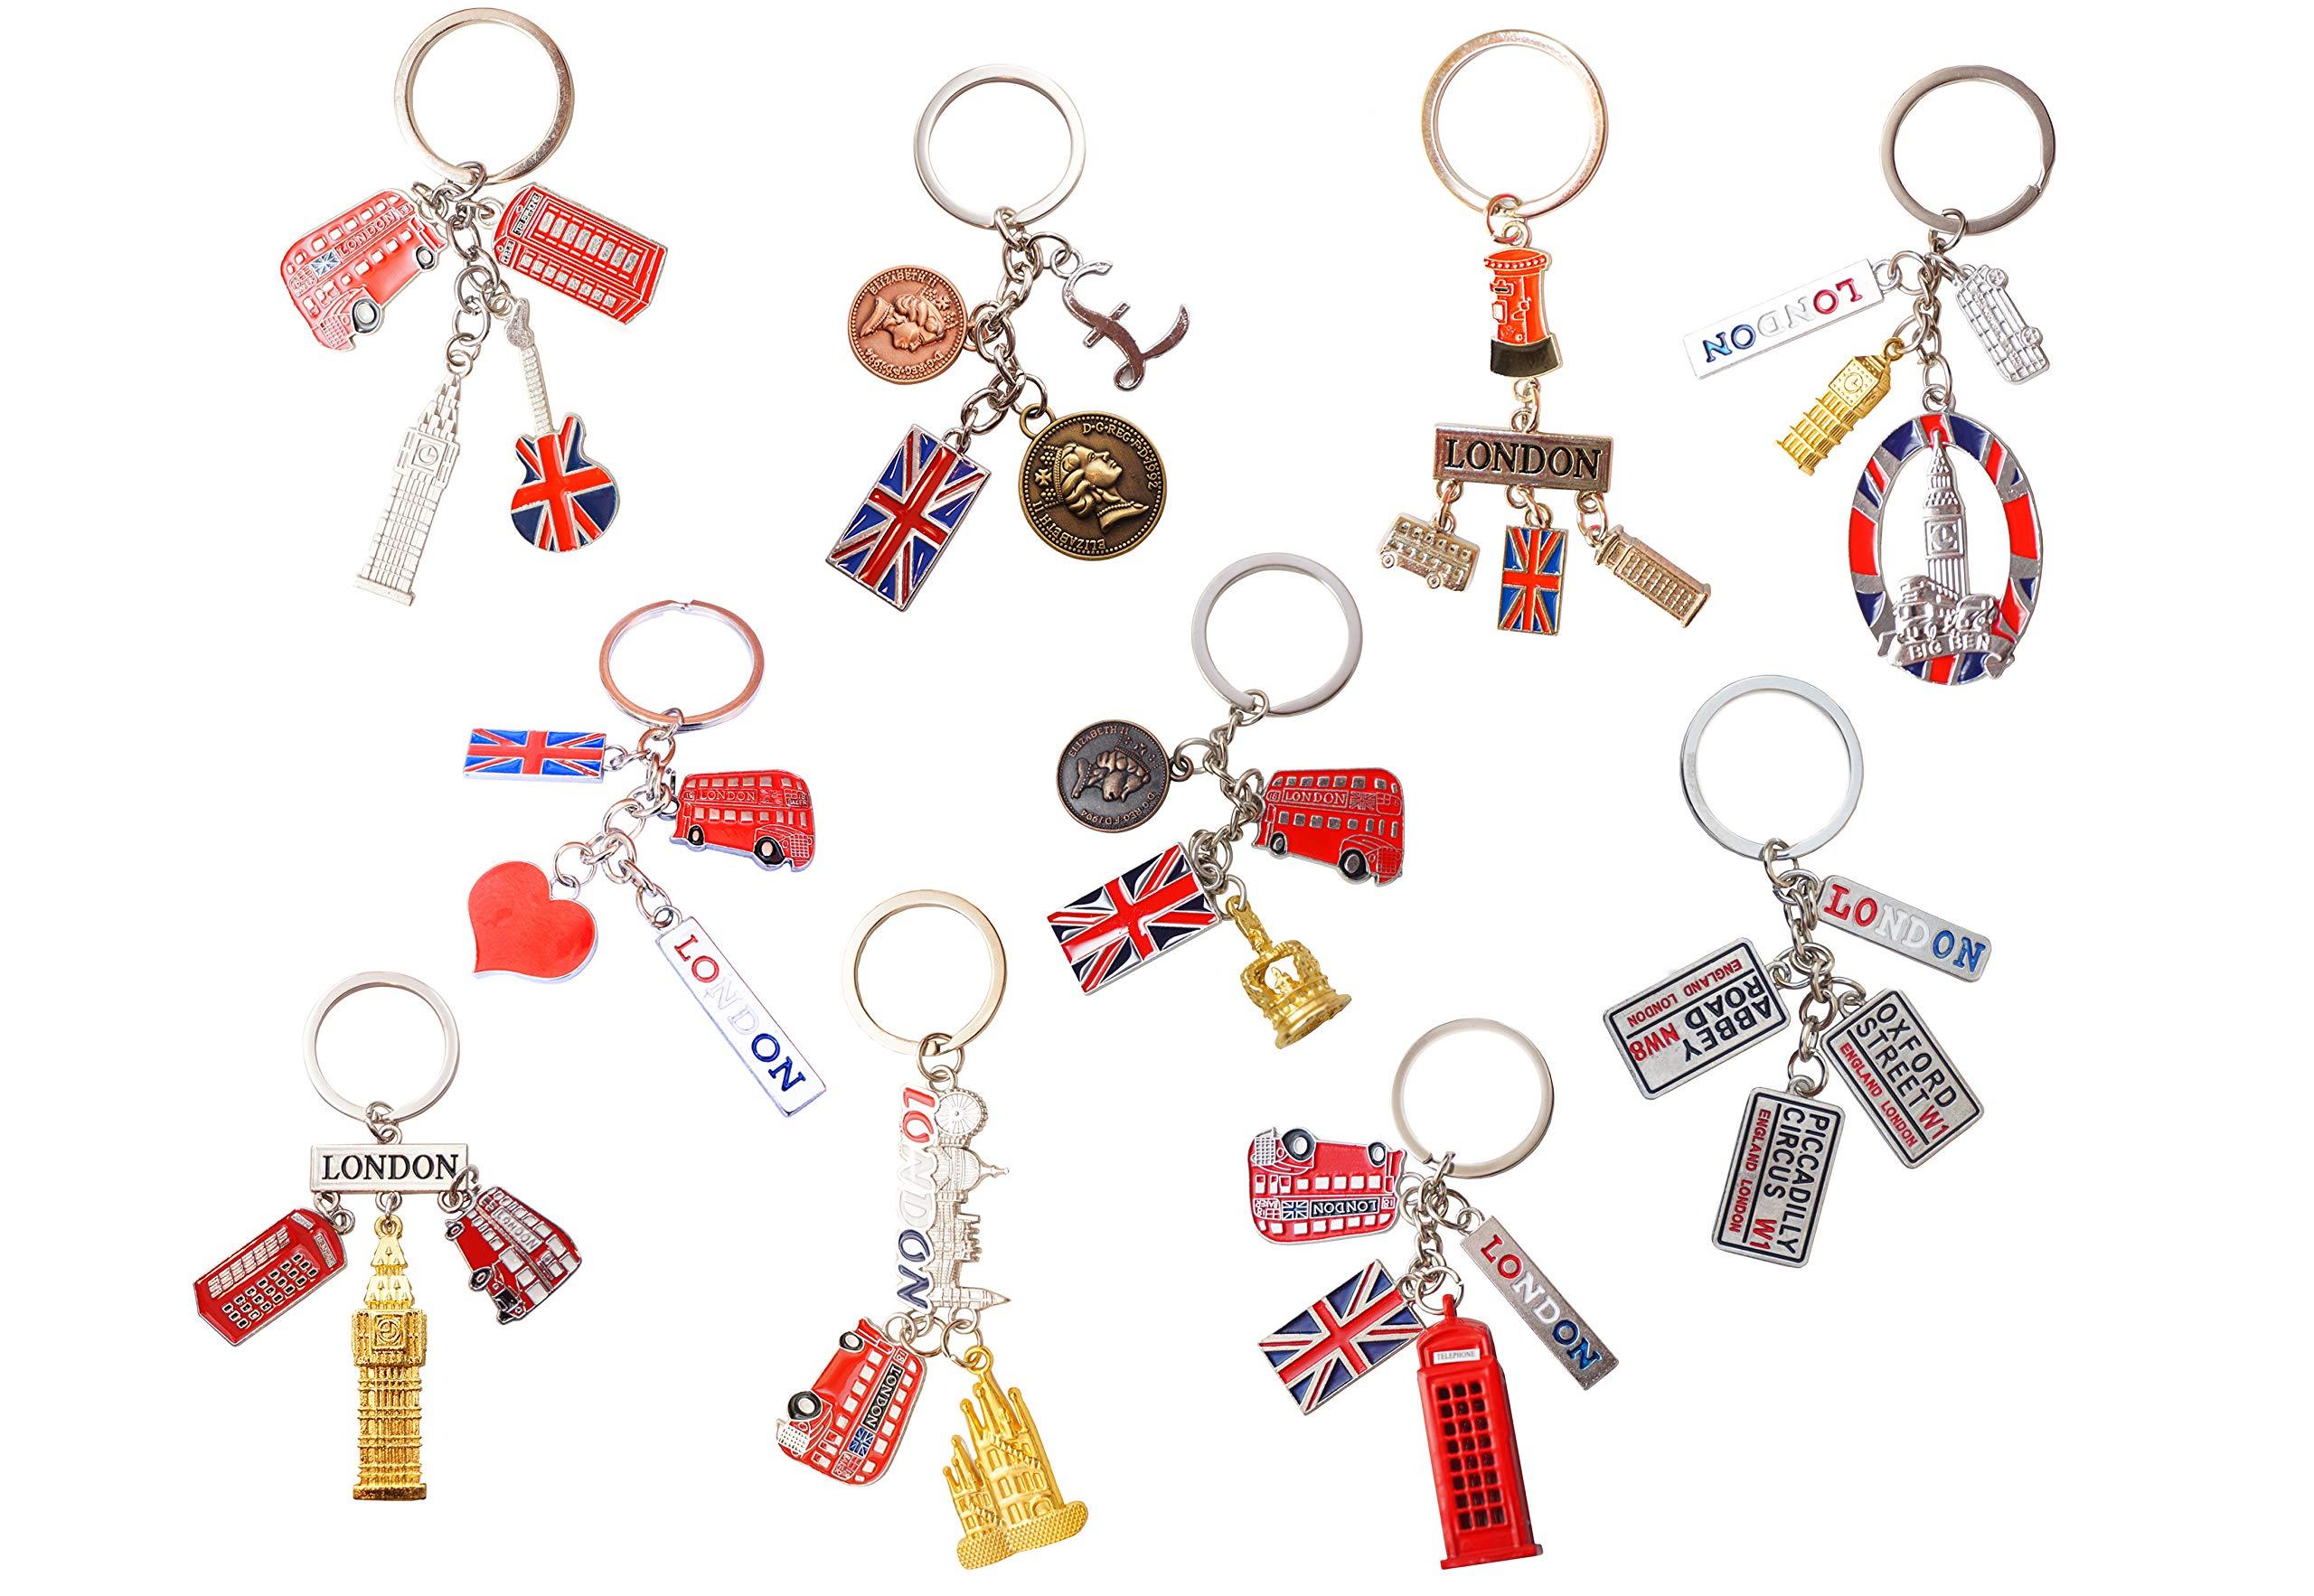 5 BRITISH MINIATURE LONDON KEY RING BRELOCK DIECAST METAL KEYCHAIN SOUVENIR GIFT